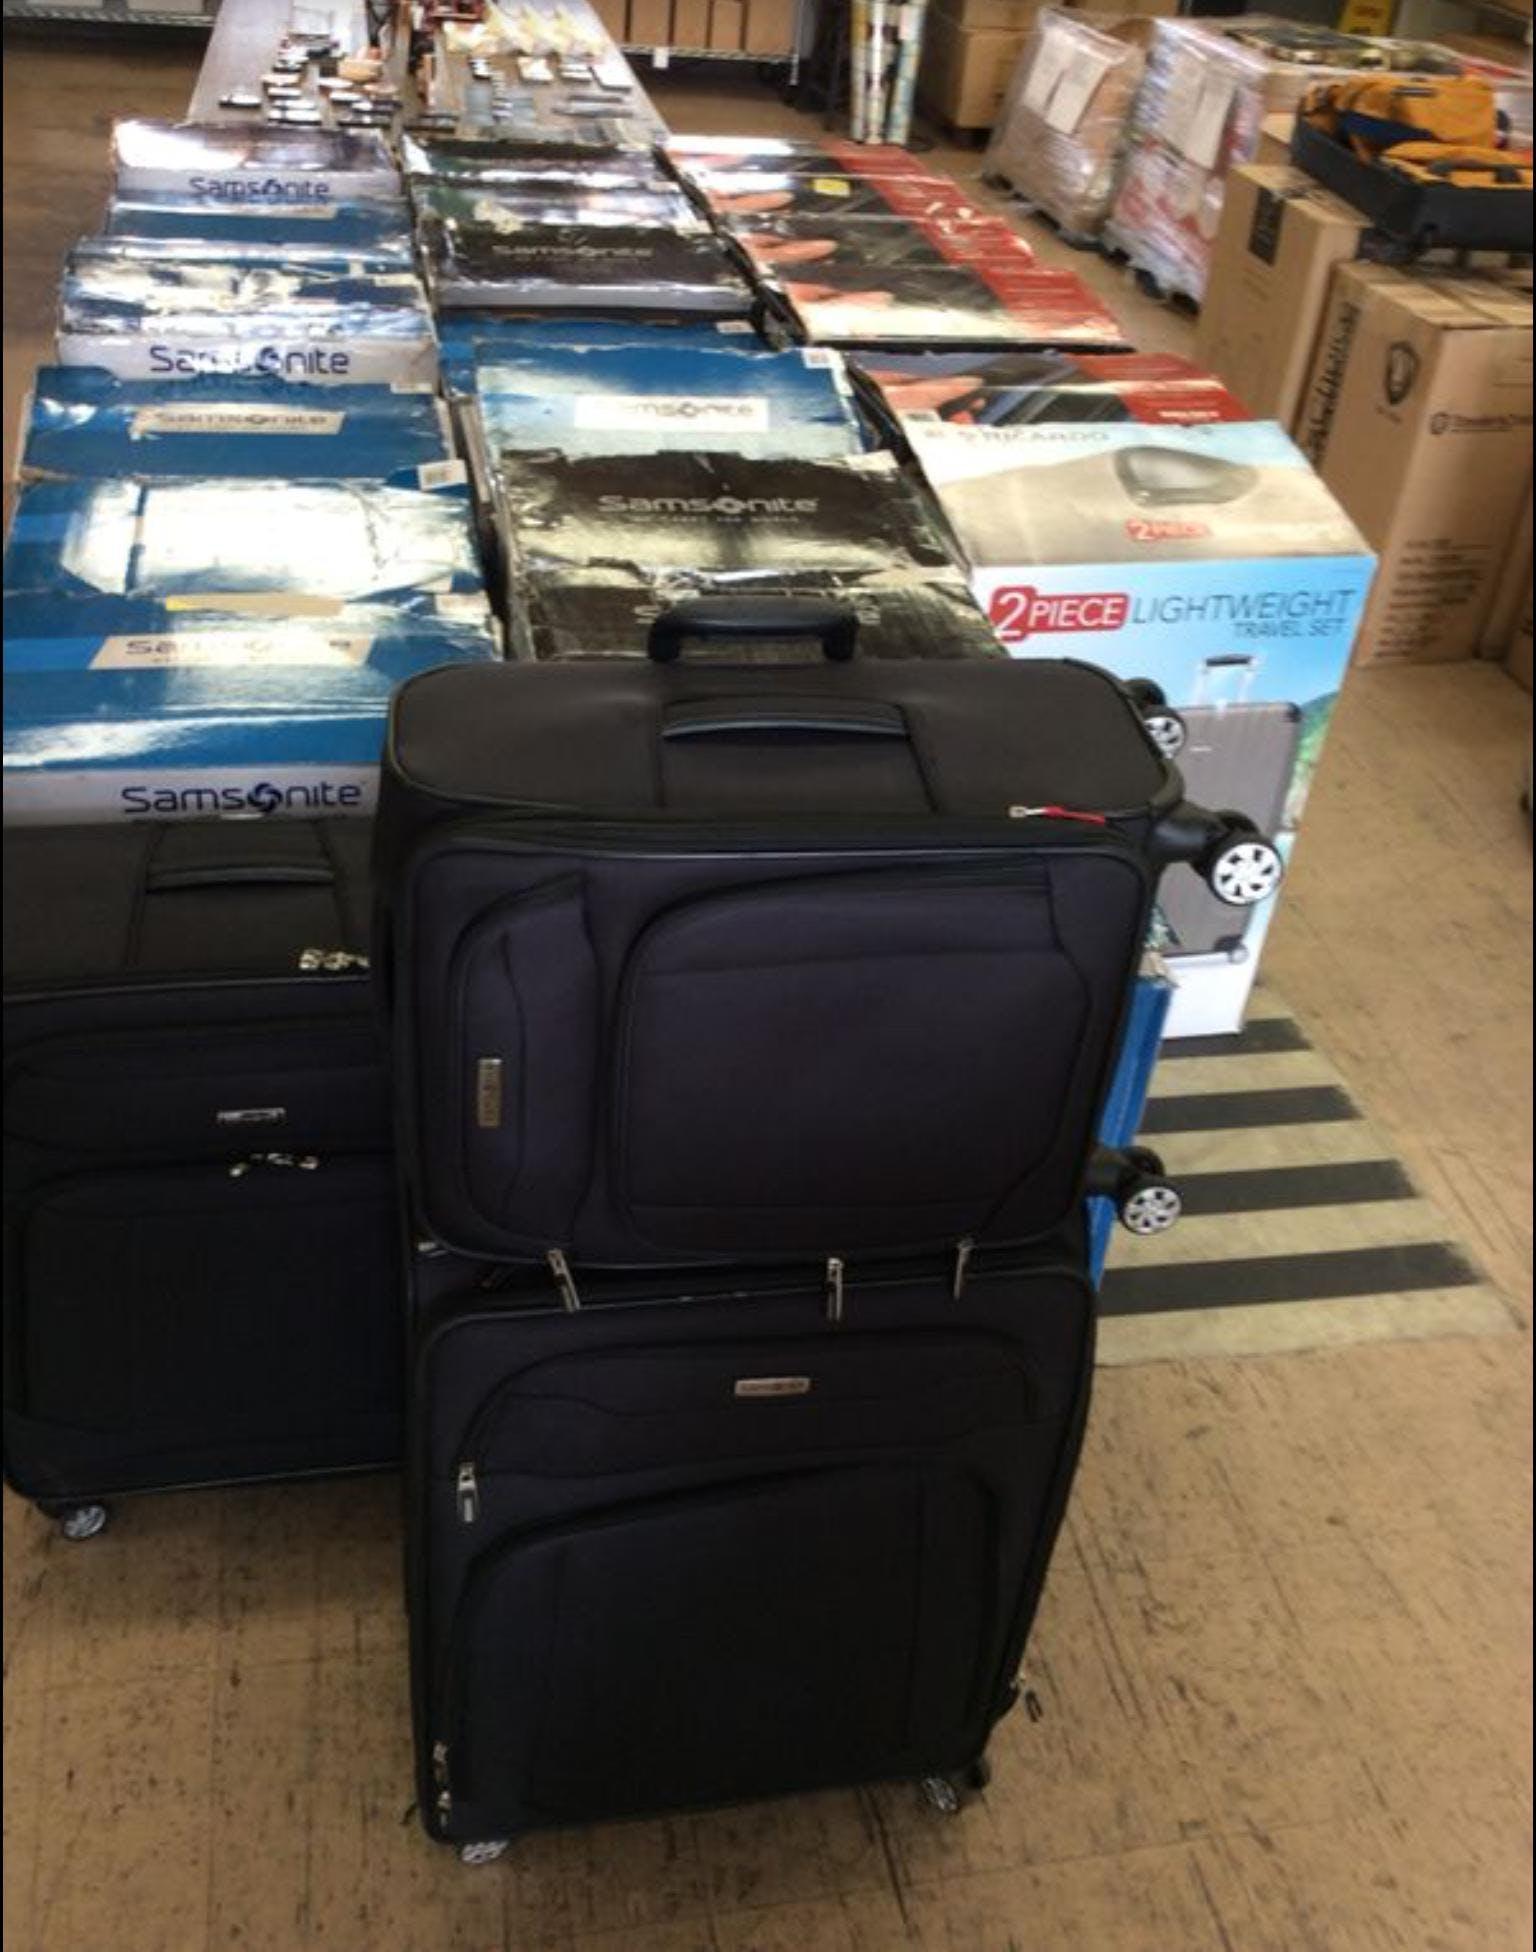 4b526240b6 Branded Luggage and Designer Handbags Warehouse Sale by 123Liquidation